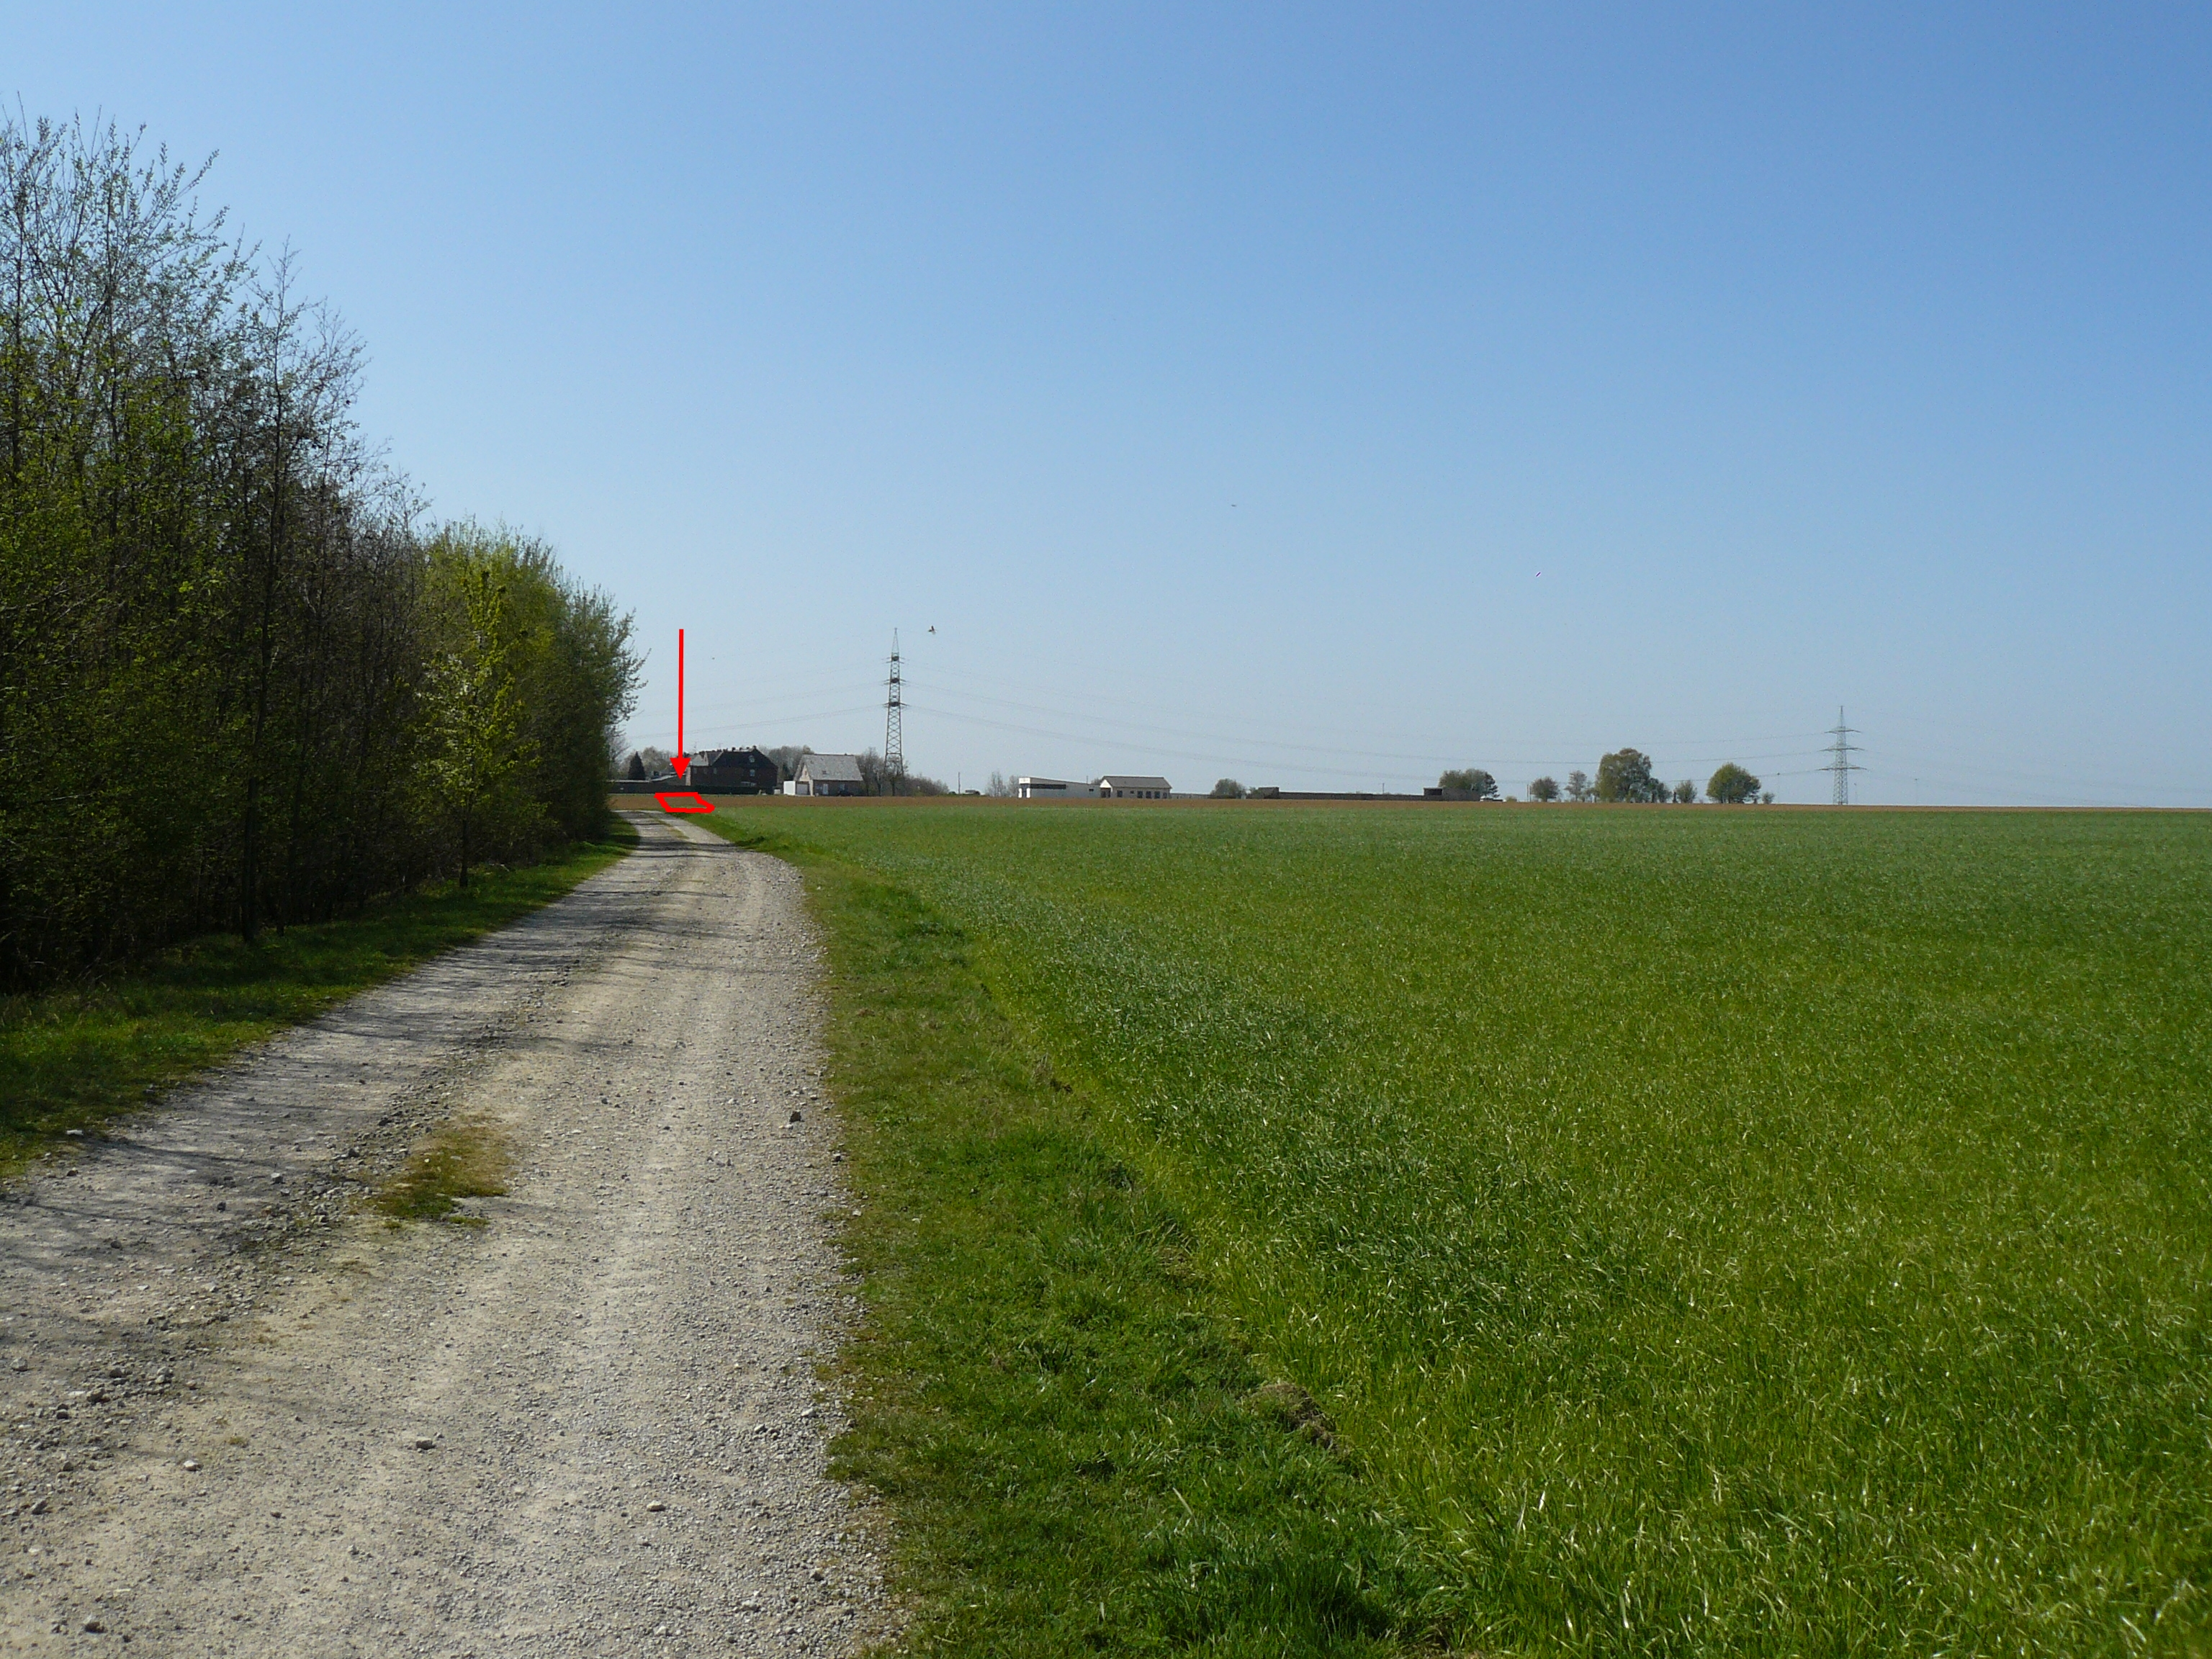 Grundstück am 18.04.2010 Bild 1